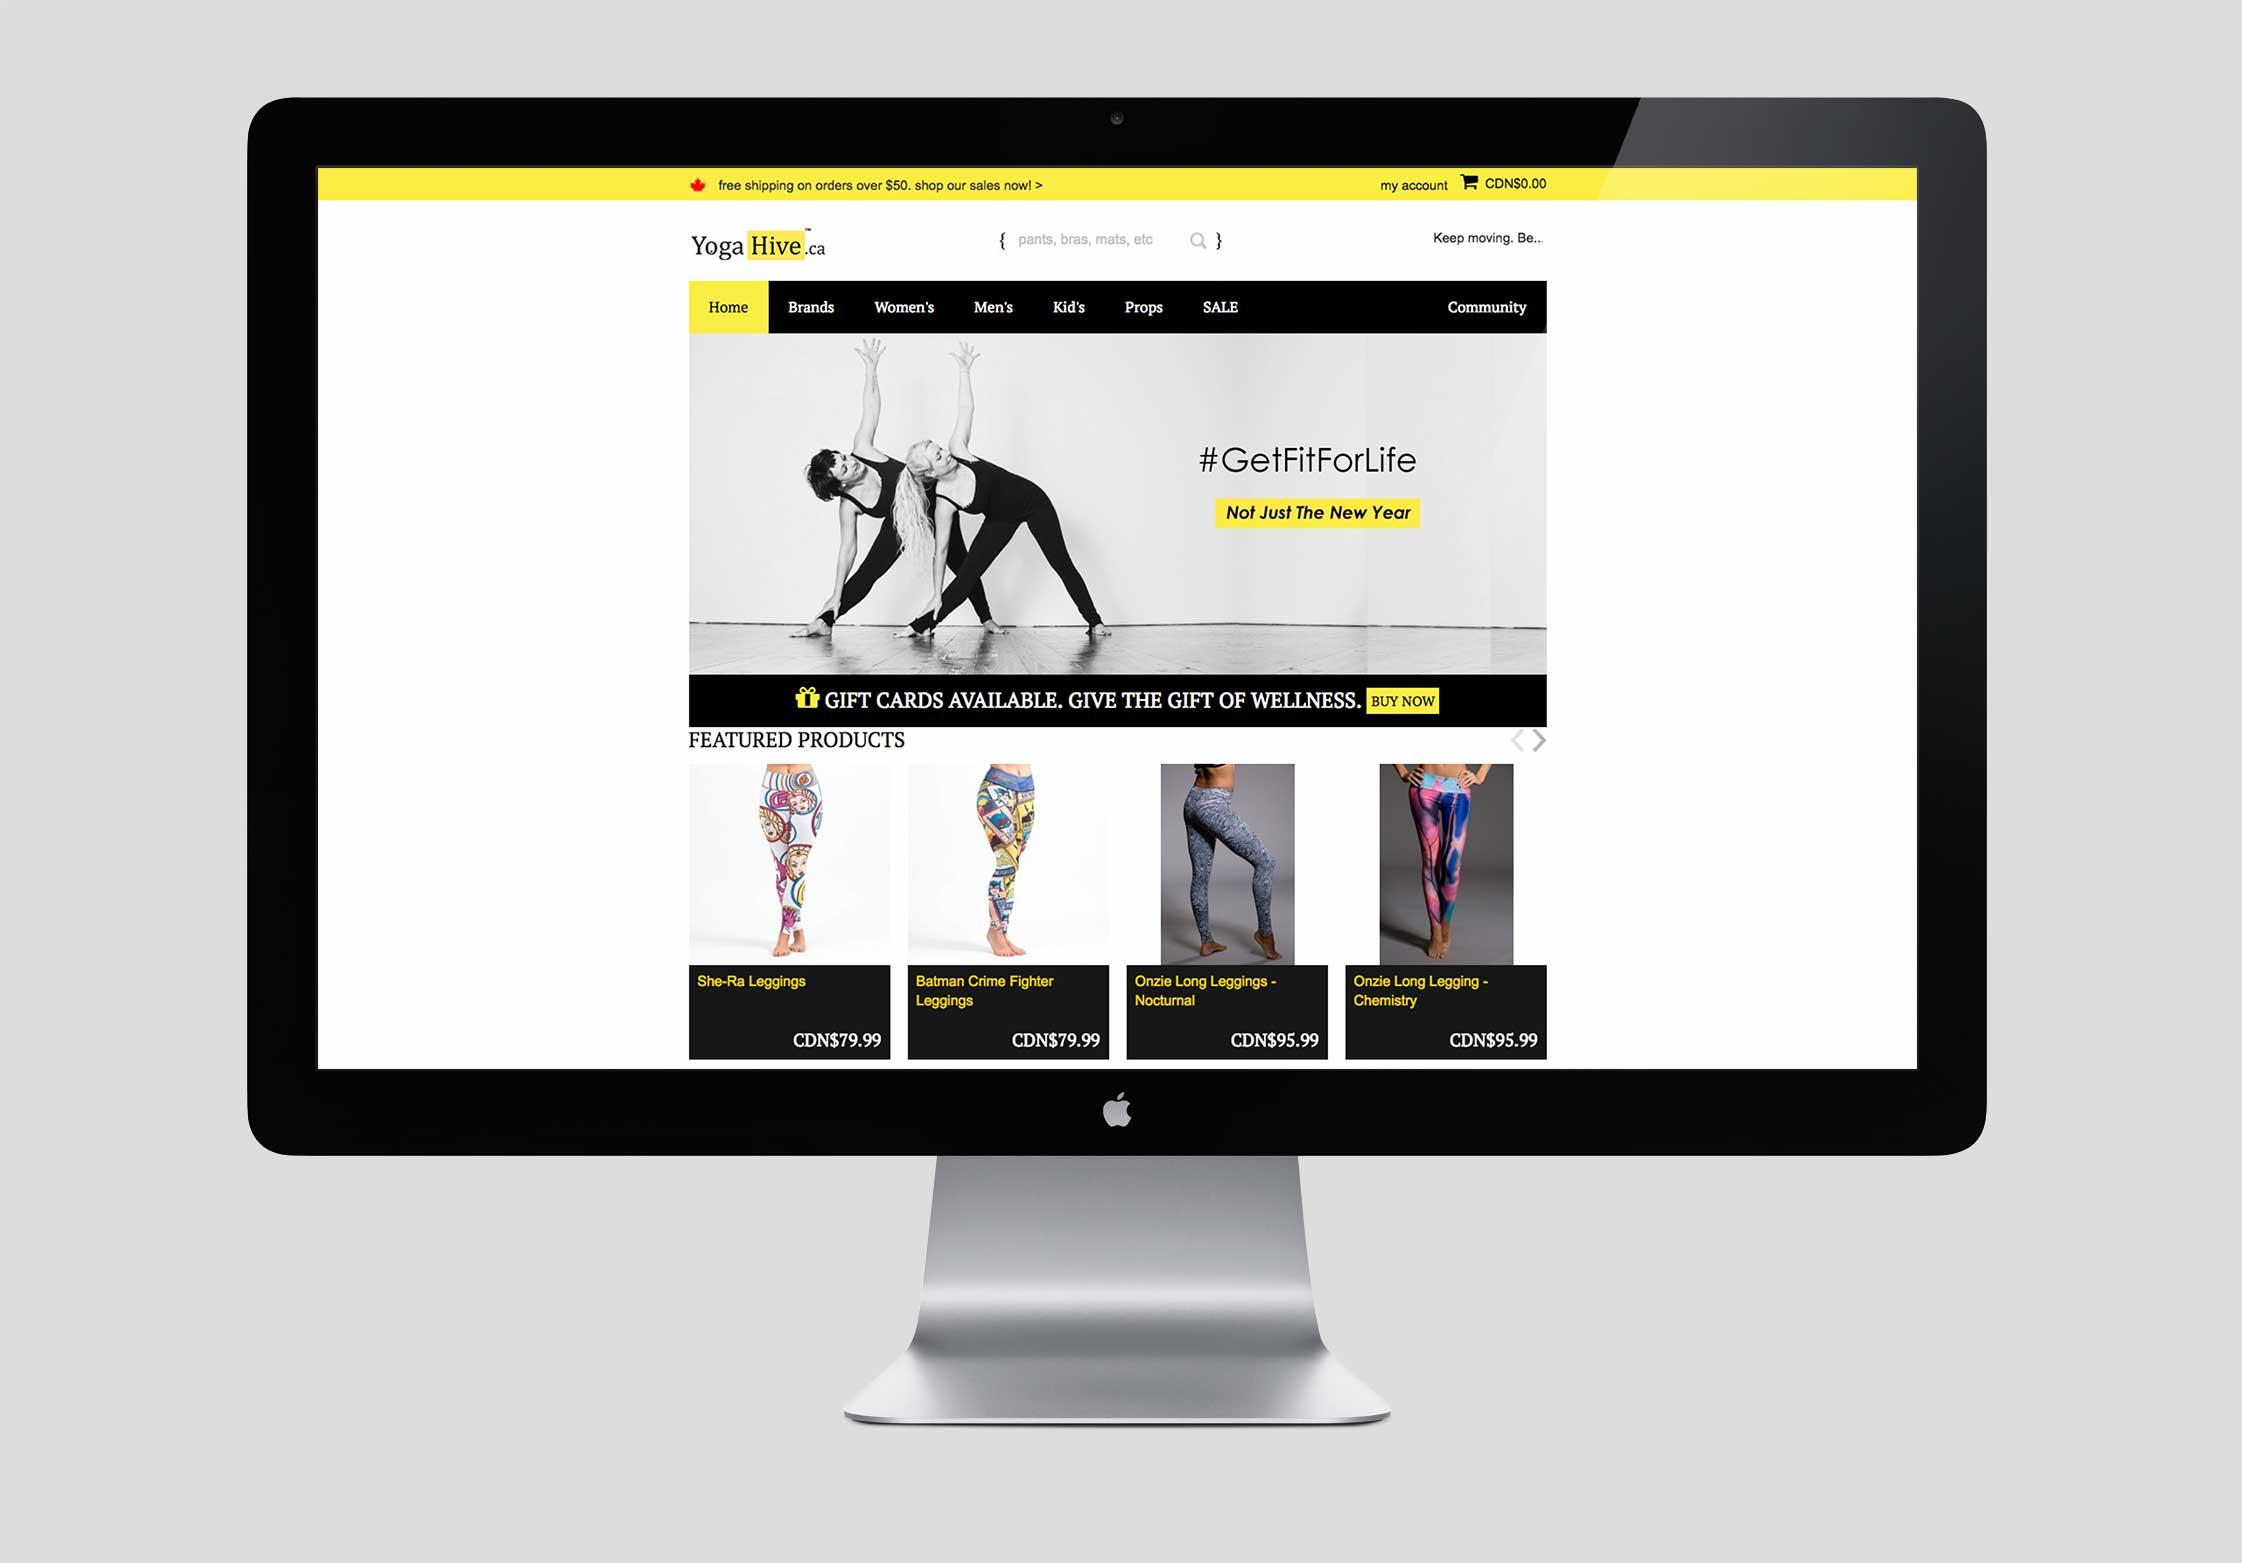 Yoga Hive website before re-design.